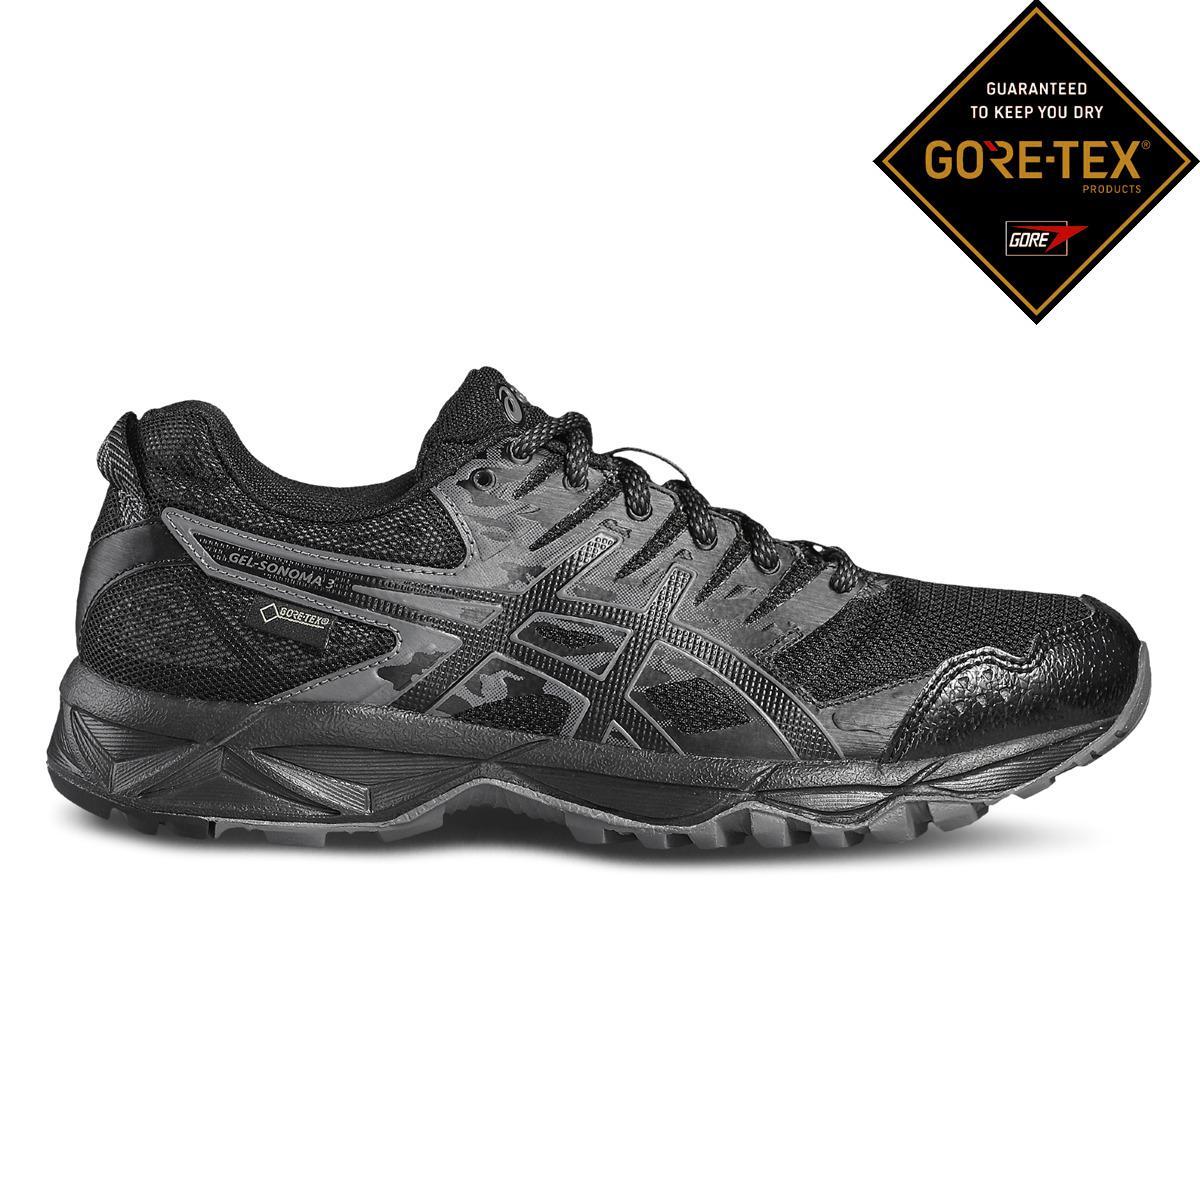 ba53bbd1120 Asics - Black Gel-sonoma 3 Gore-tex Trail Running Shoes - Lyst. View  fullscreen